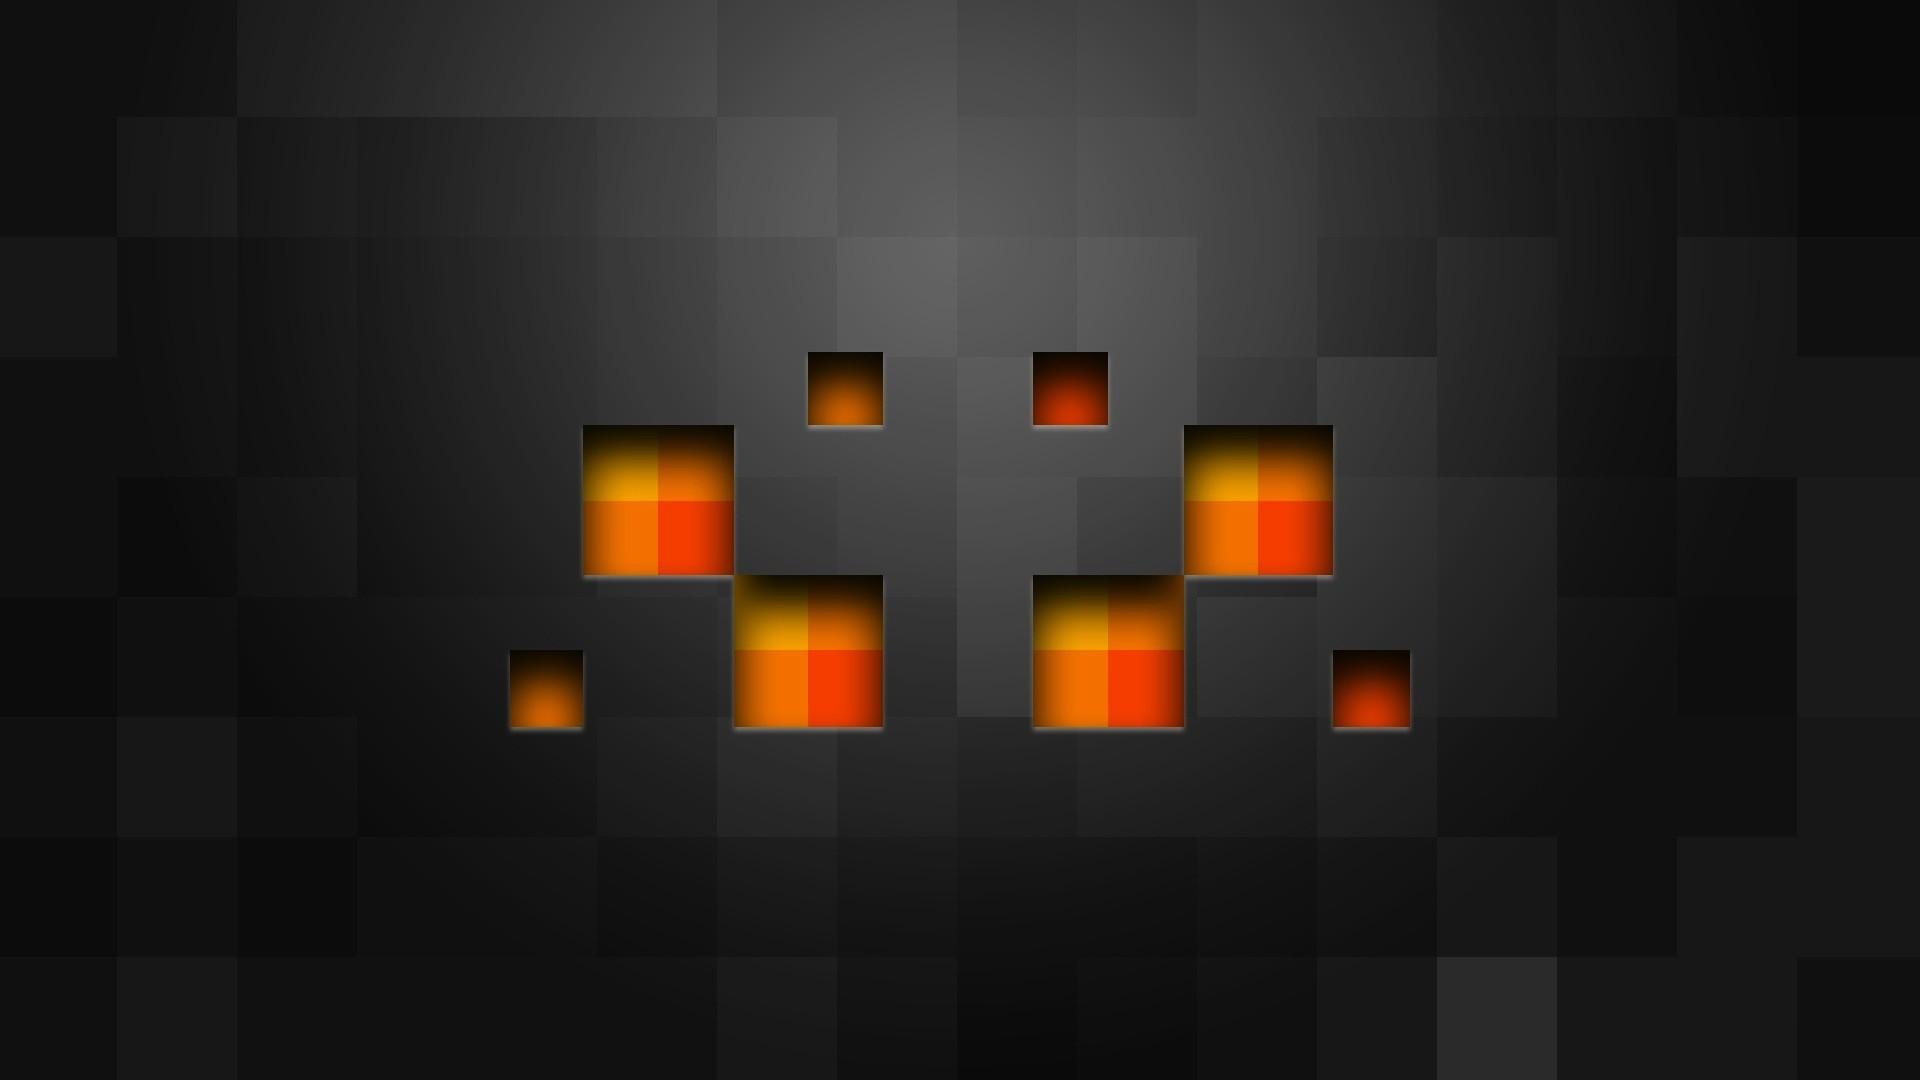 Best Wallpaper Minecraft Gold - Backgrounds_Gray_background__Minecraft_099426_  Pic_611359.jpg